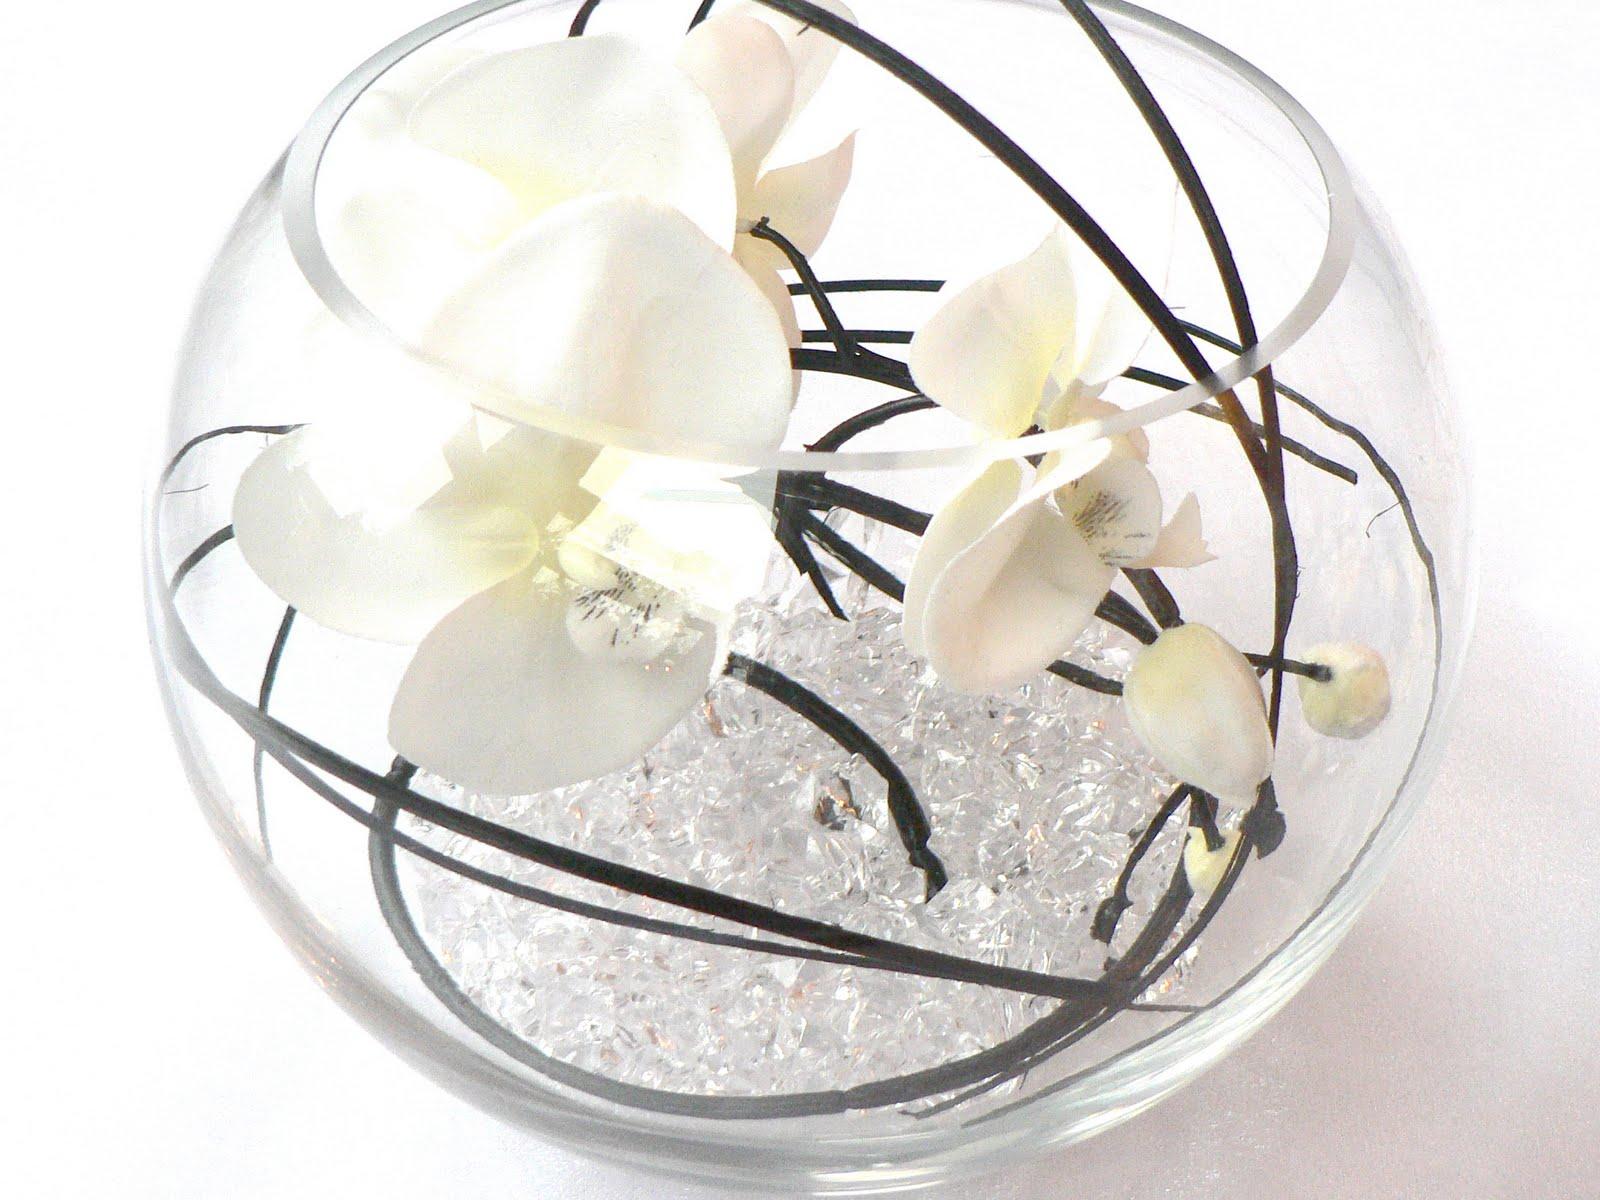 Dorable Wedding Goldfish Bowl Centerpieces Crest - Wedding Idea 2018 ...